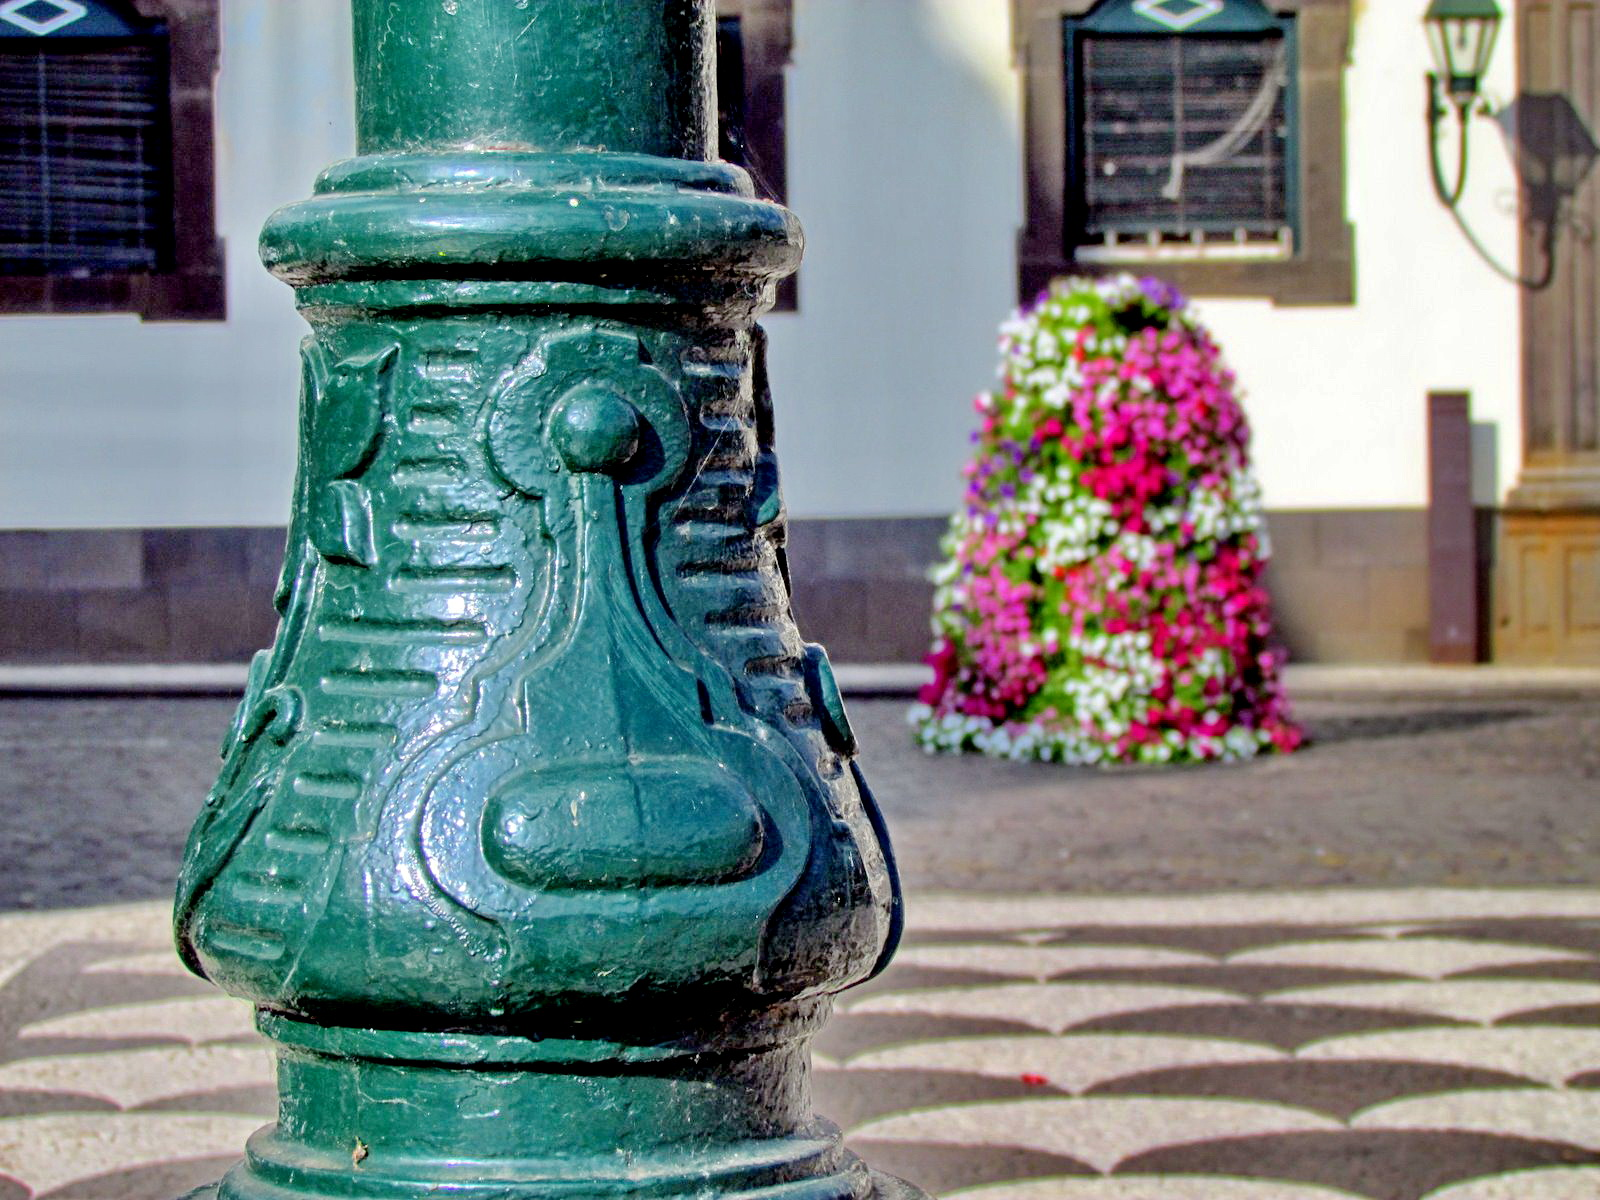 a detail in Praça do Município